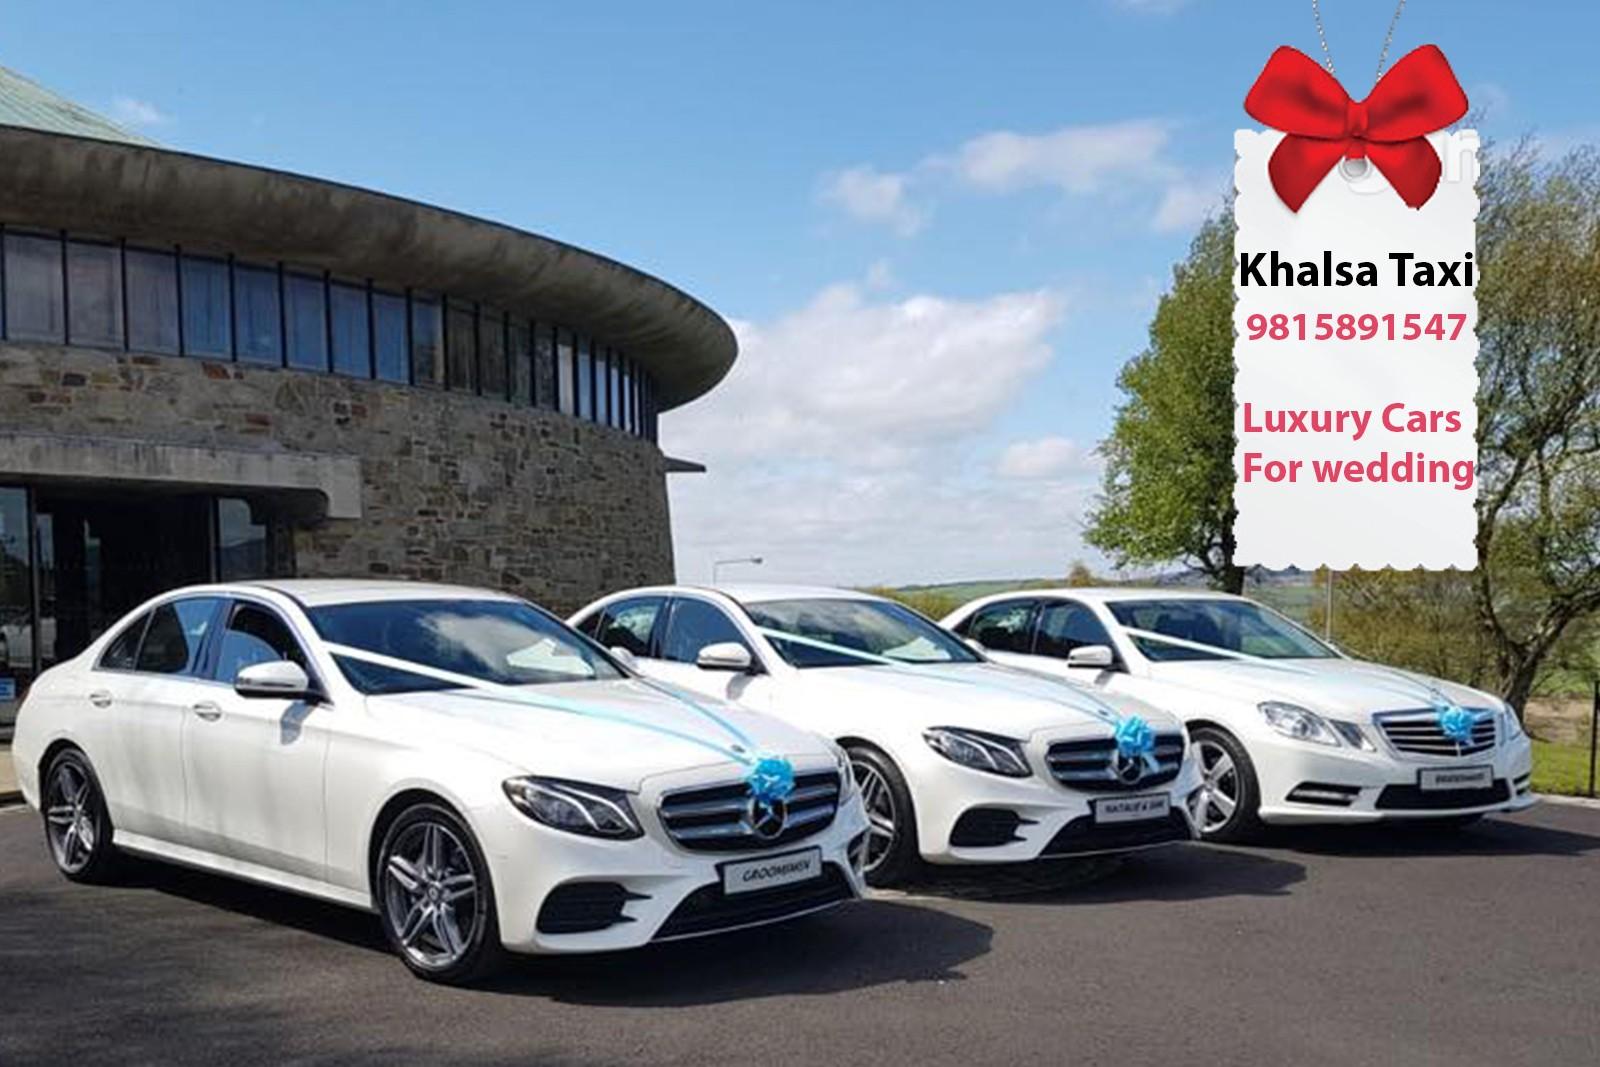 luxury wedding cab hire in ambala luxury wedding car hire in ambala and hire wedding cars in ambala audi & mercedes